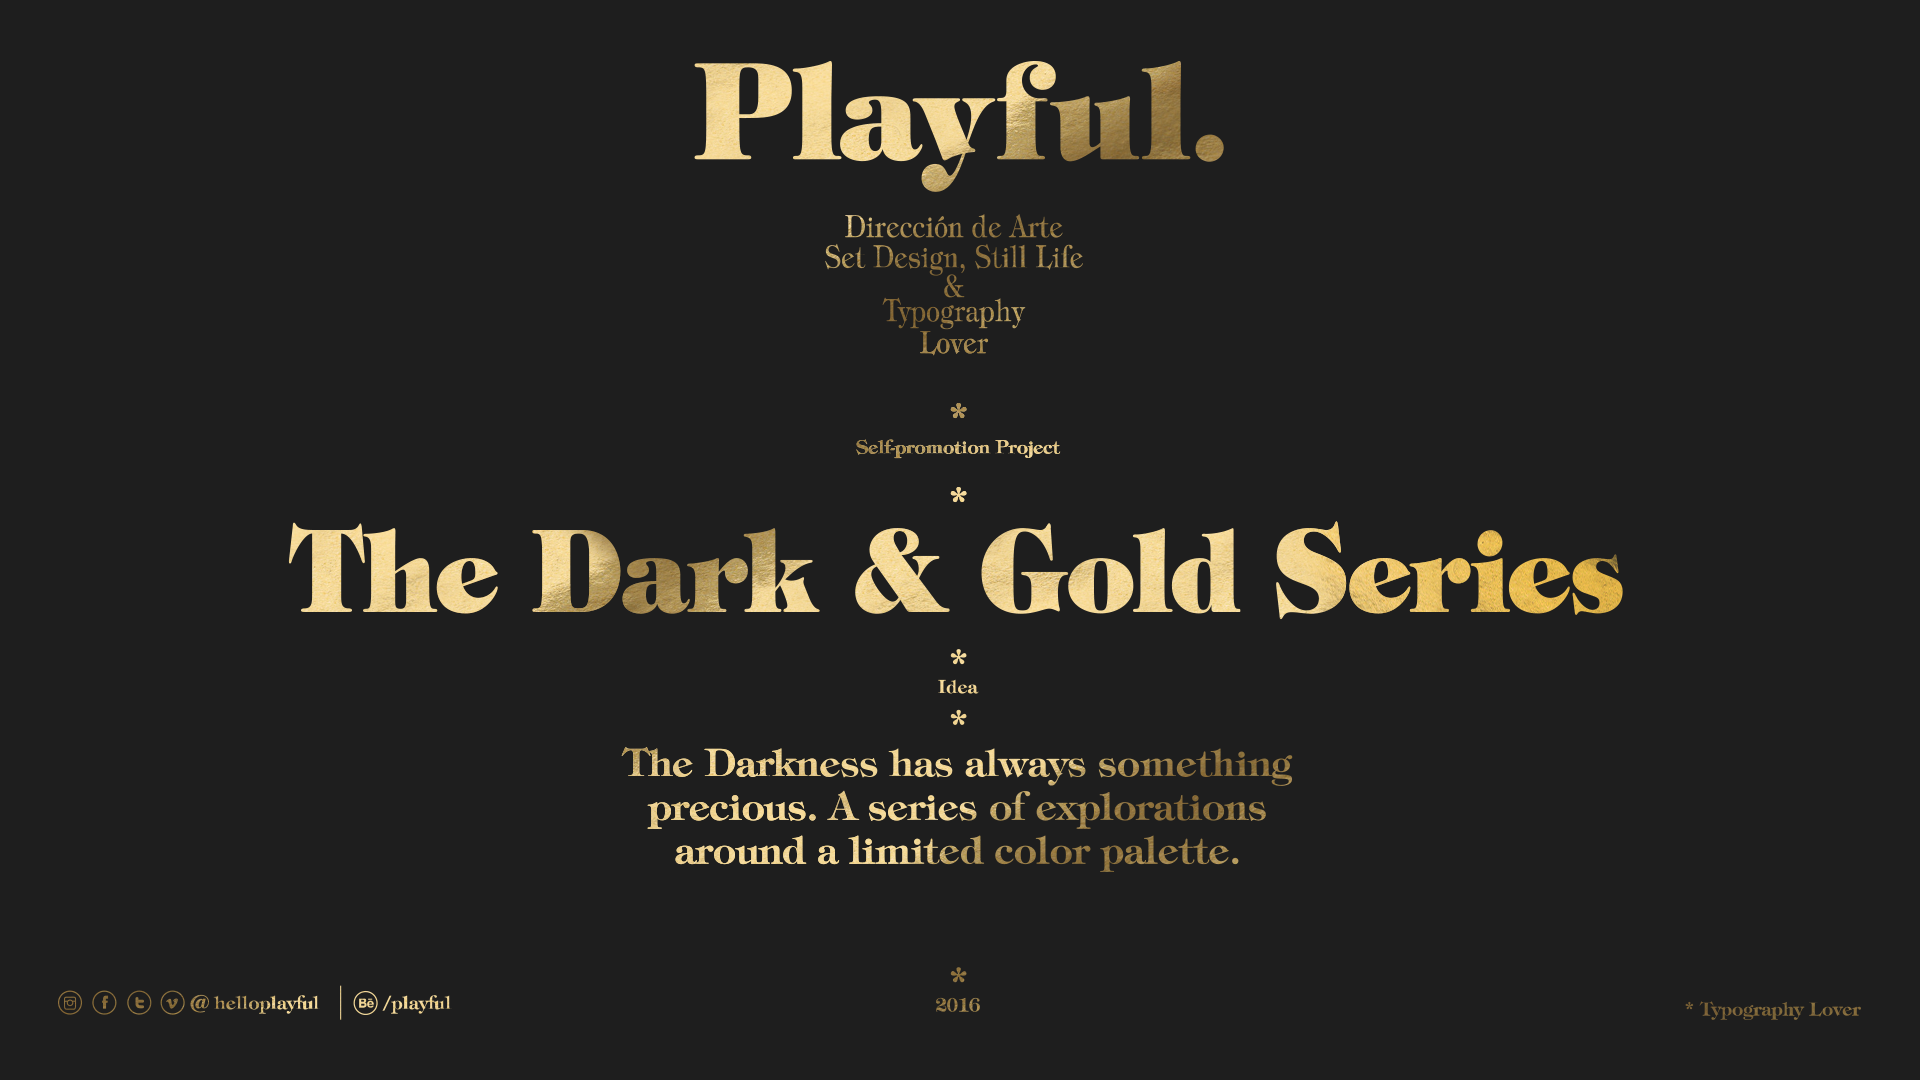 Serie of WIPS into de Darkness